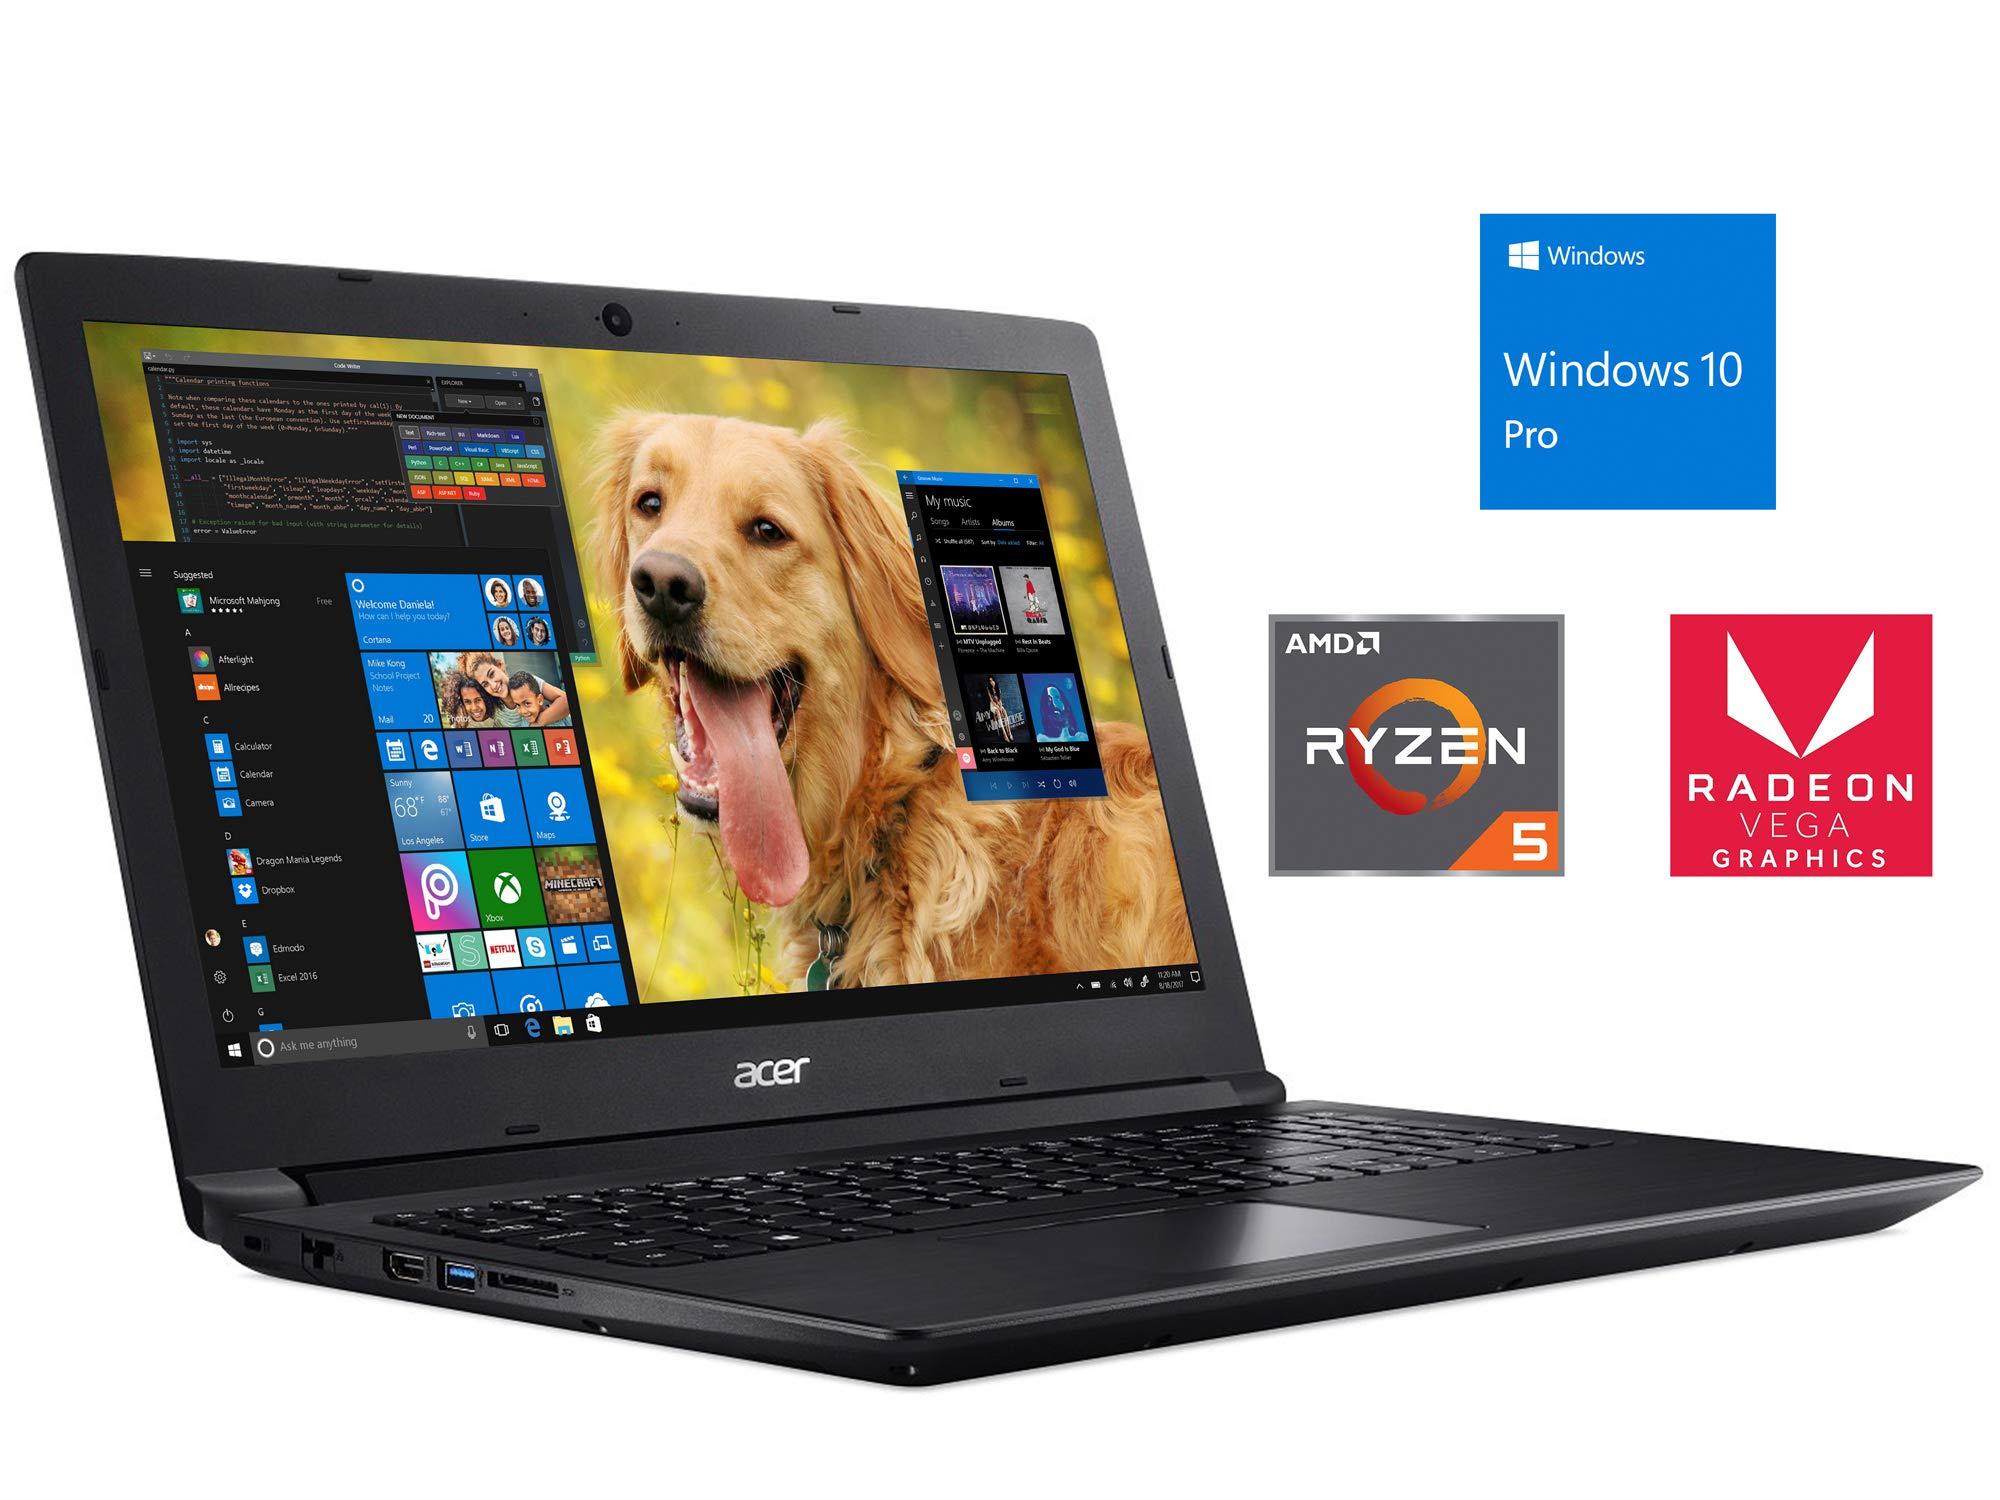 "Acer Aspire 3 Notebook, 15.6"" HD, AMD Quad-Core Ryzen 5 2500U Upto 3.6GHz, 16GB RAM, 256GB SSD, Radeon Vega 8, HDMI, Card Reader, Wi-Fi, Bluetooth, Windows 10 Pro"